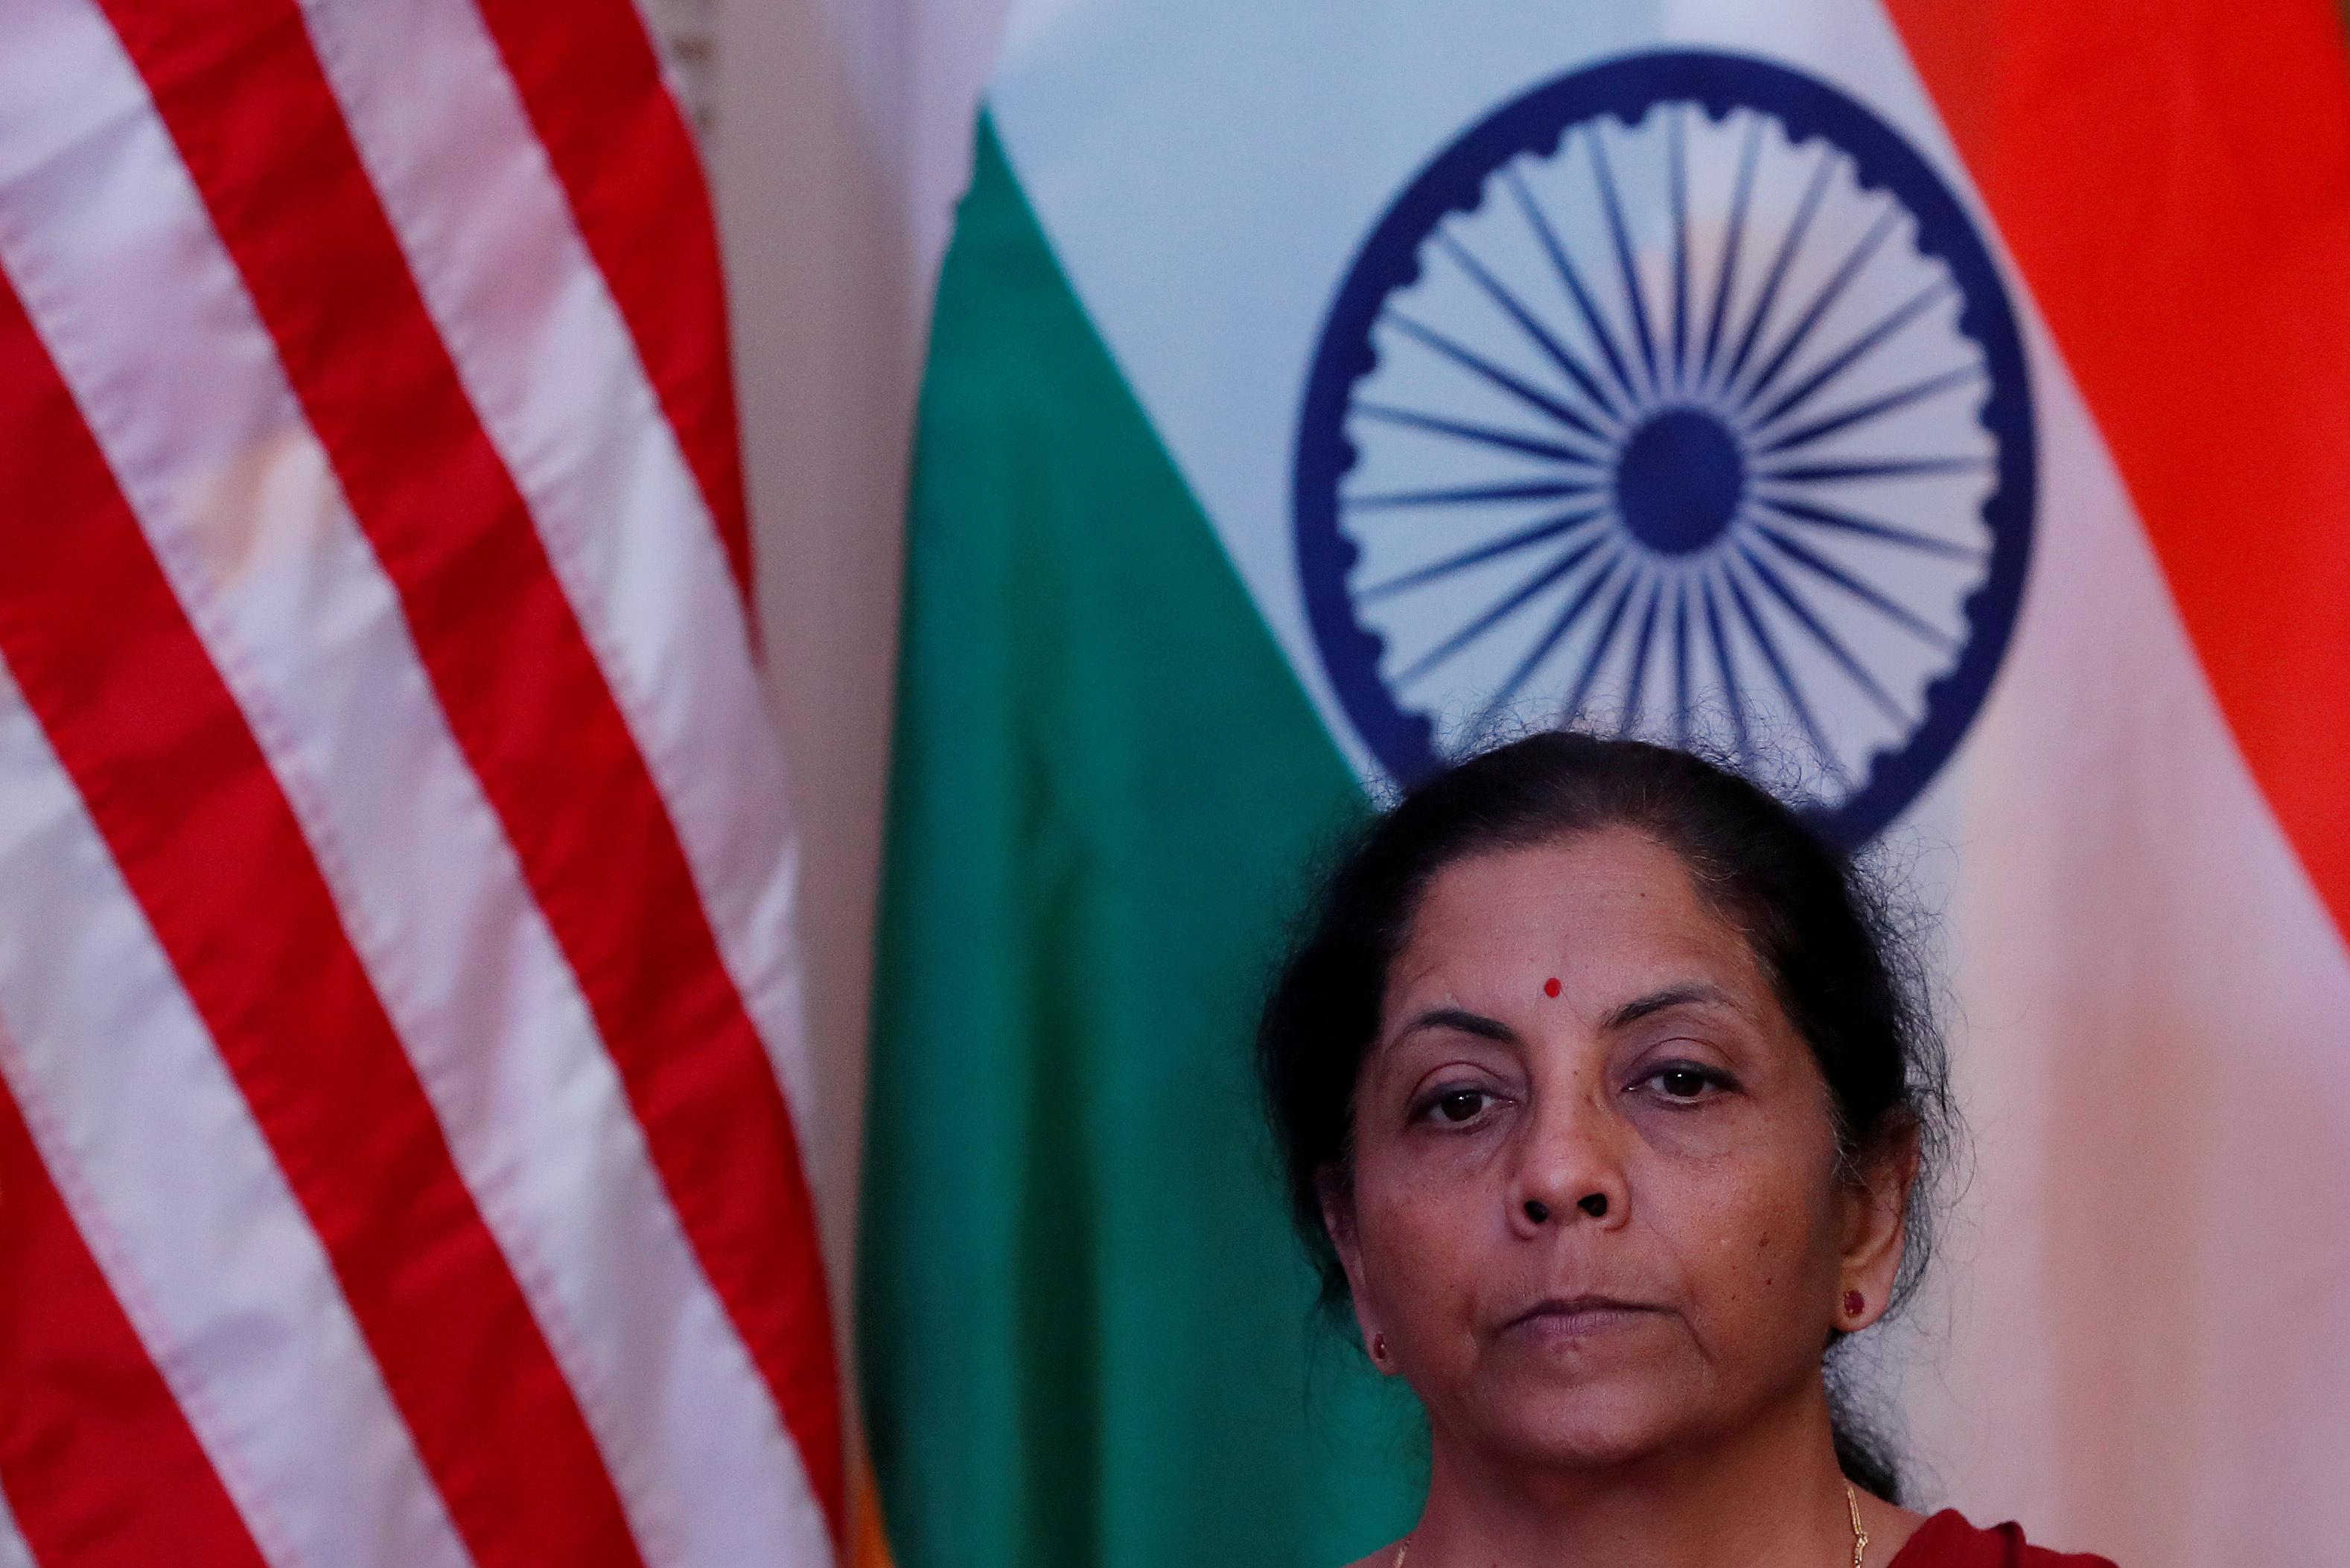 India's Finance Minister Nirmala Sitharaman attends a joint news conference with U.S. Treasury Secretary Steven Mnuchin in New Delhi, India, November 1, 2019. REUTERS/Adnan Abidi/File Photo